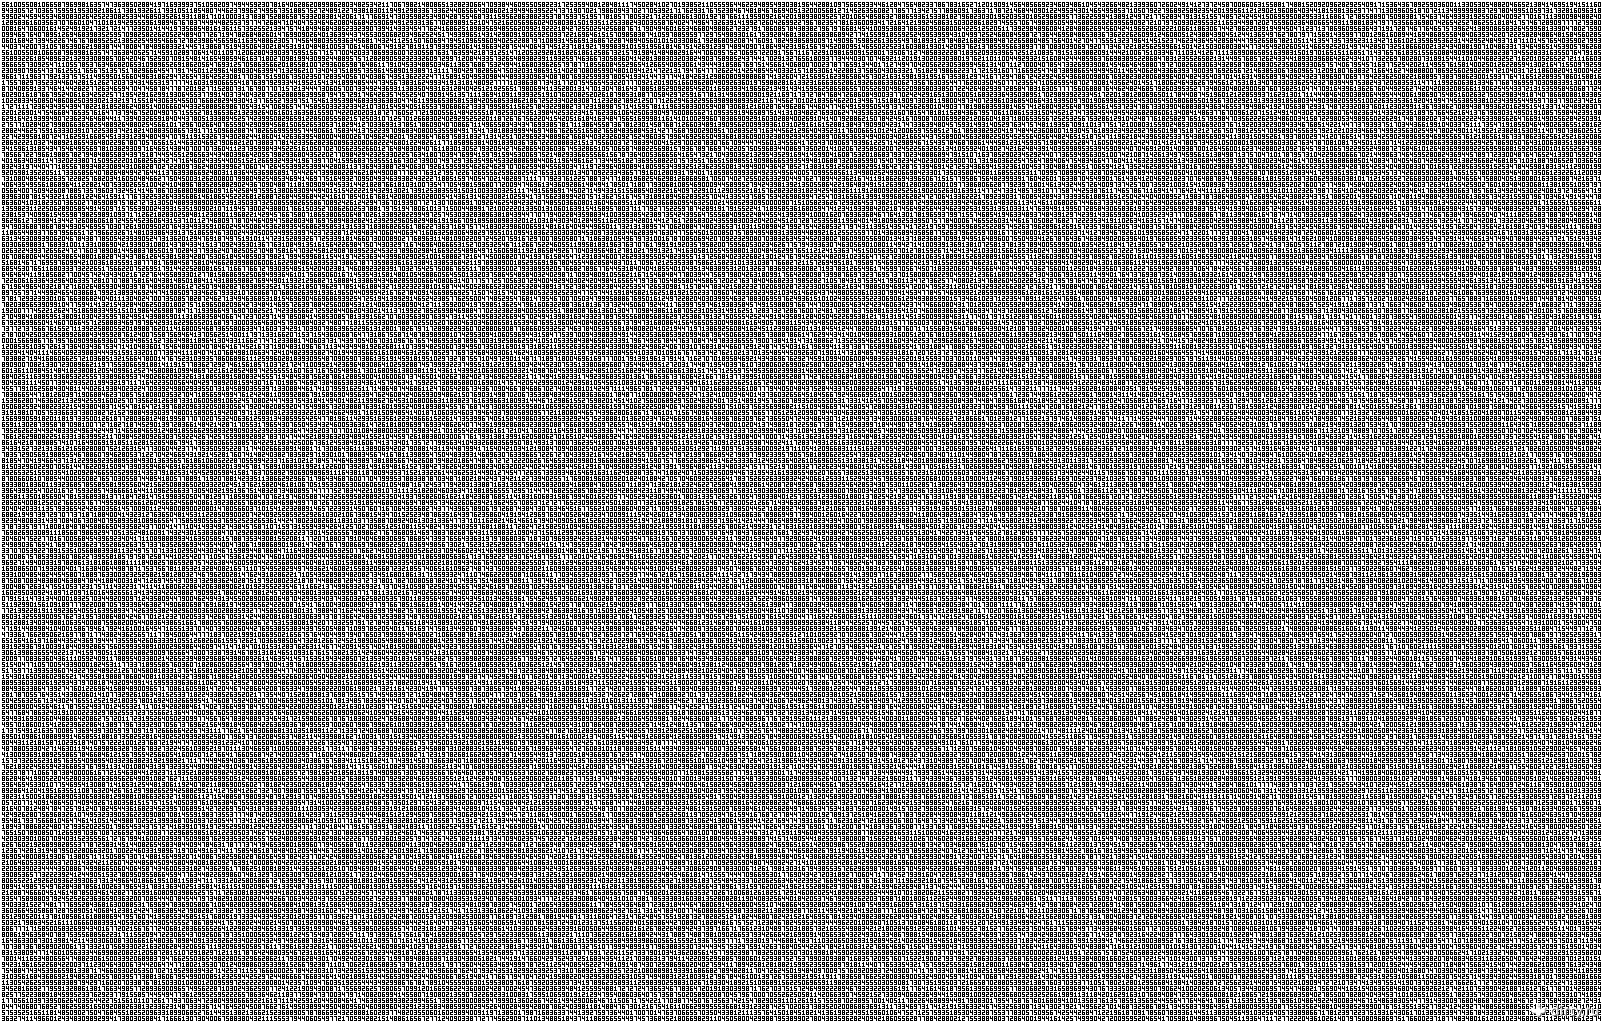 398138_original.png (1604×1024)